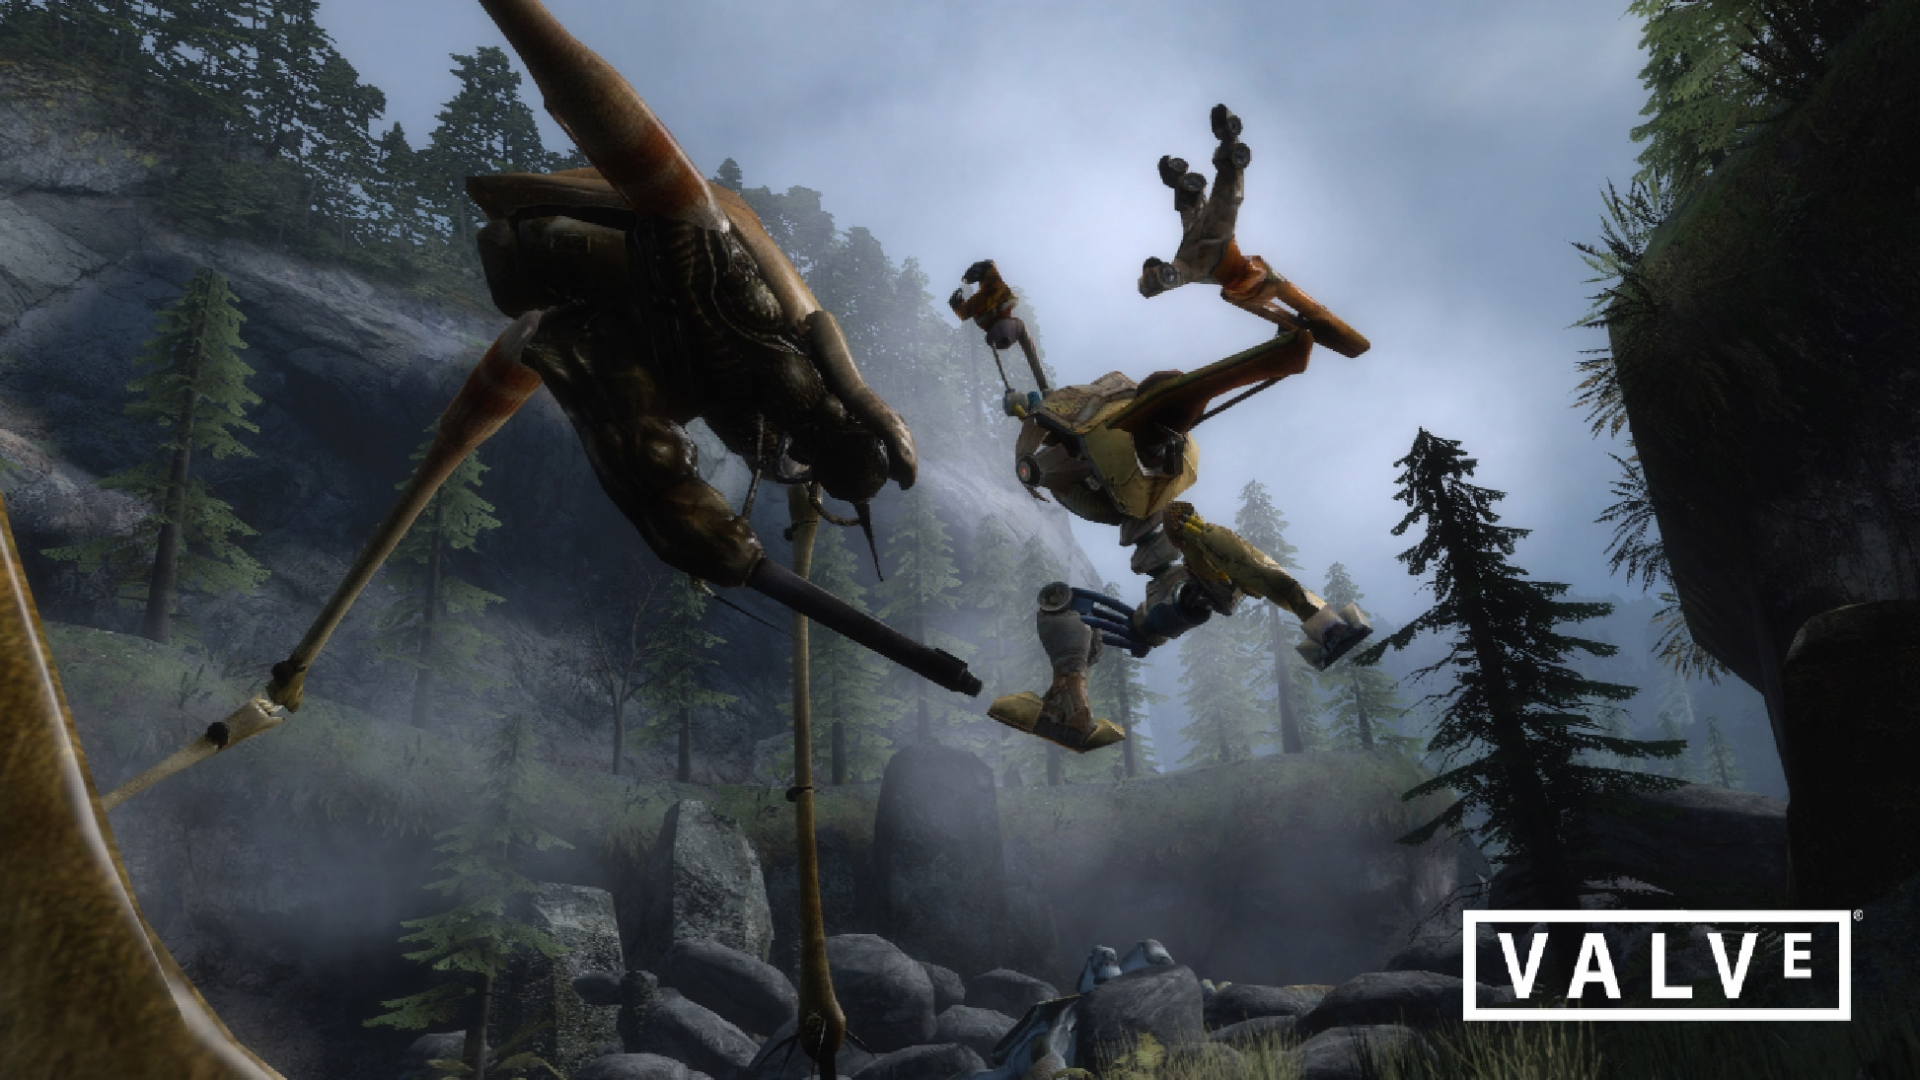 Арт к игре Half-Life 2: Episode Two